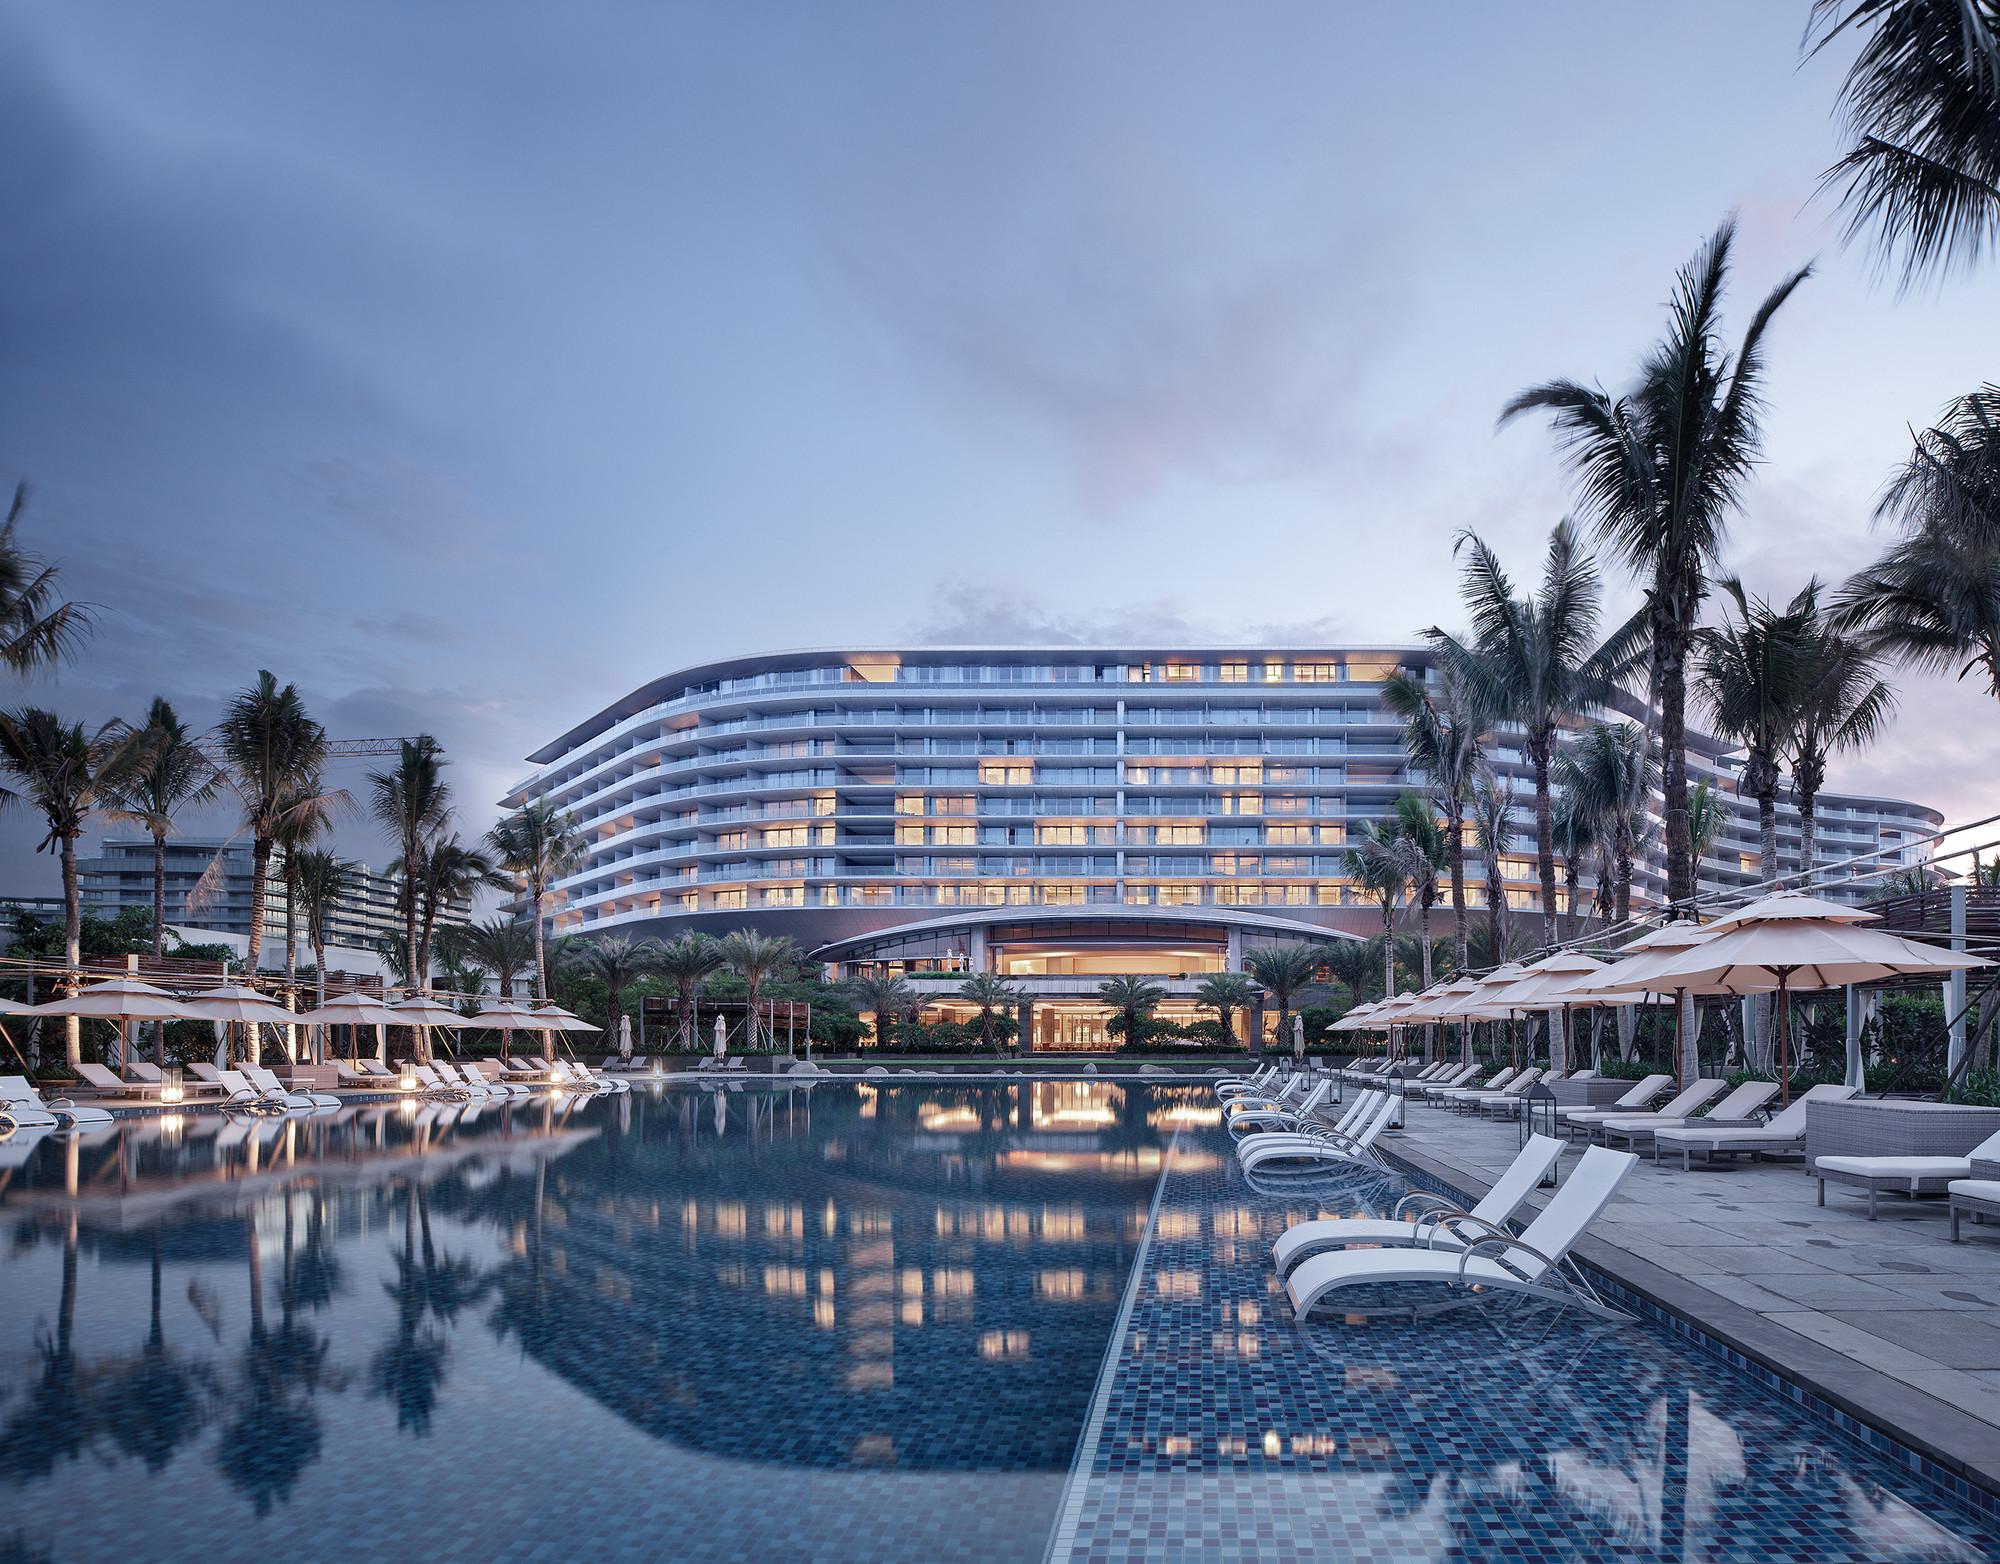 Parkside Hotel and Resort in Victoria_TL Lighting Design Hospitality